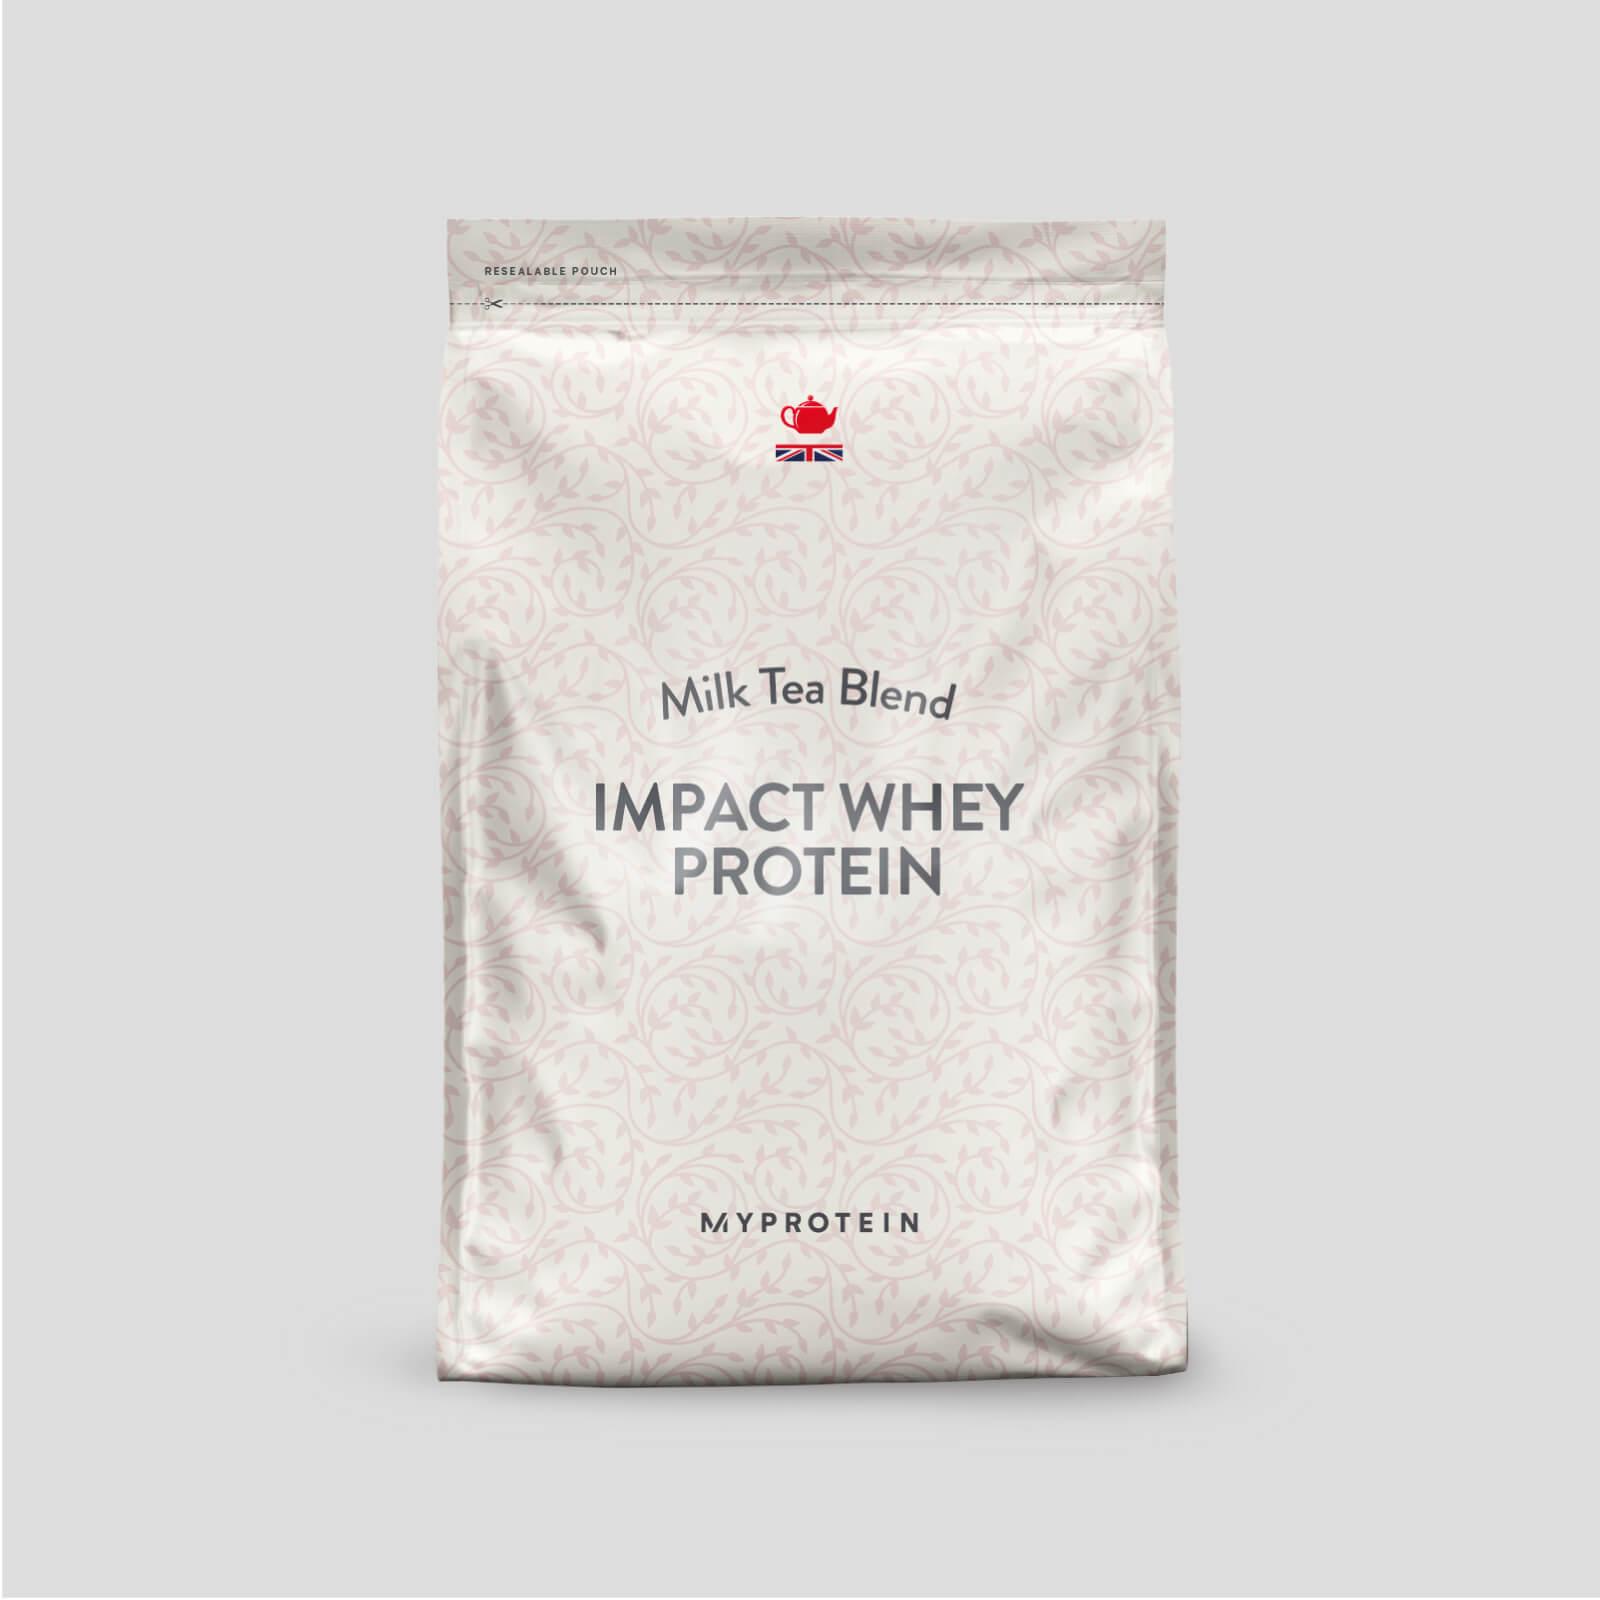 Myprotein Impact Whey Protein - Thé au Lait - 1kg - Milk Tea